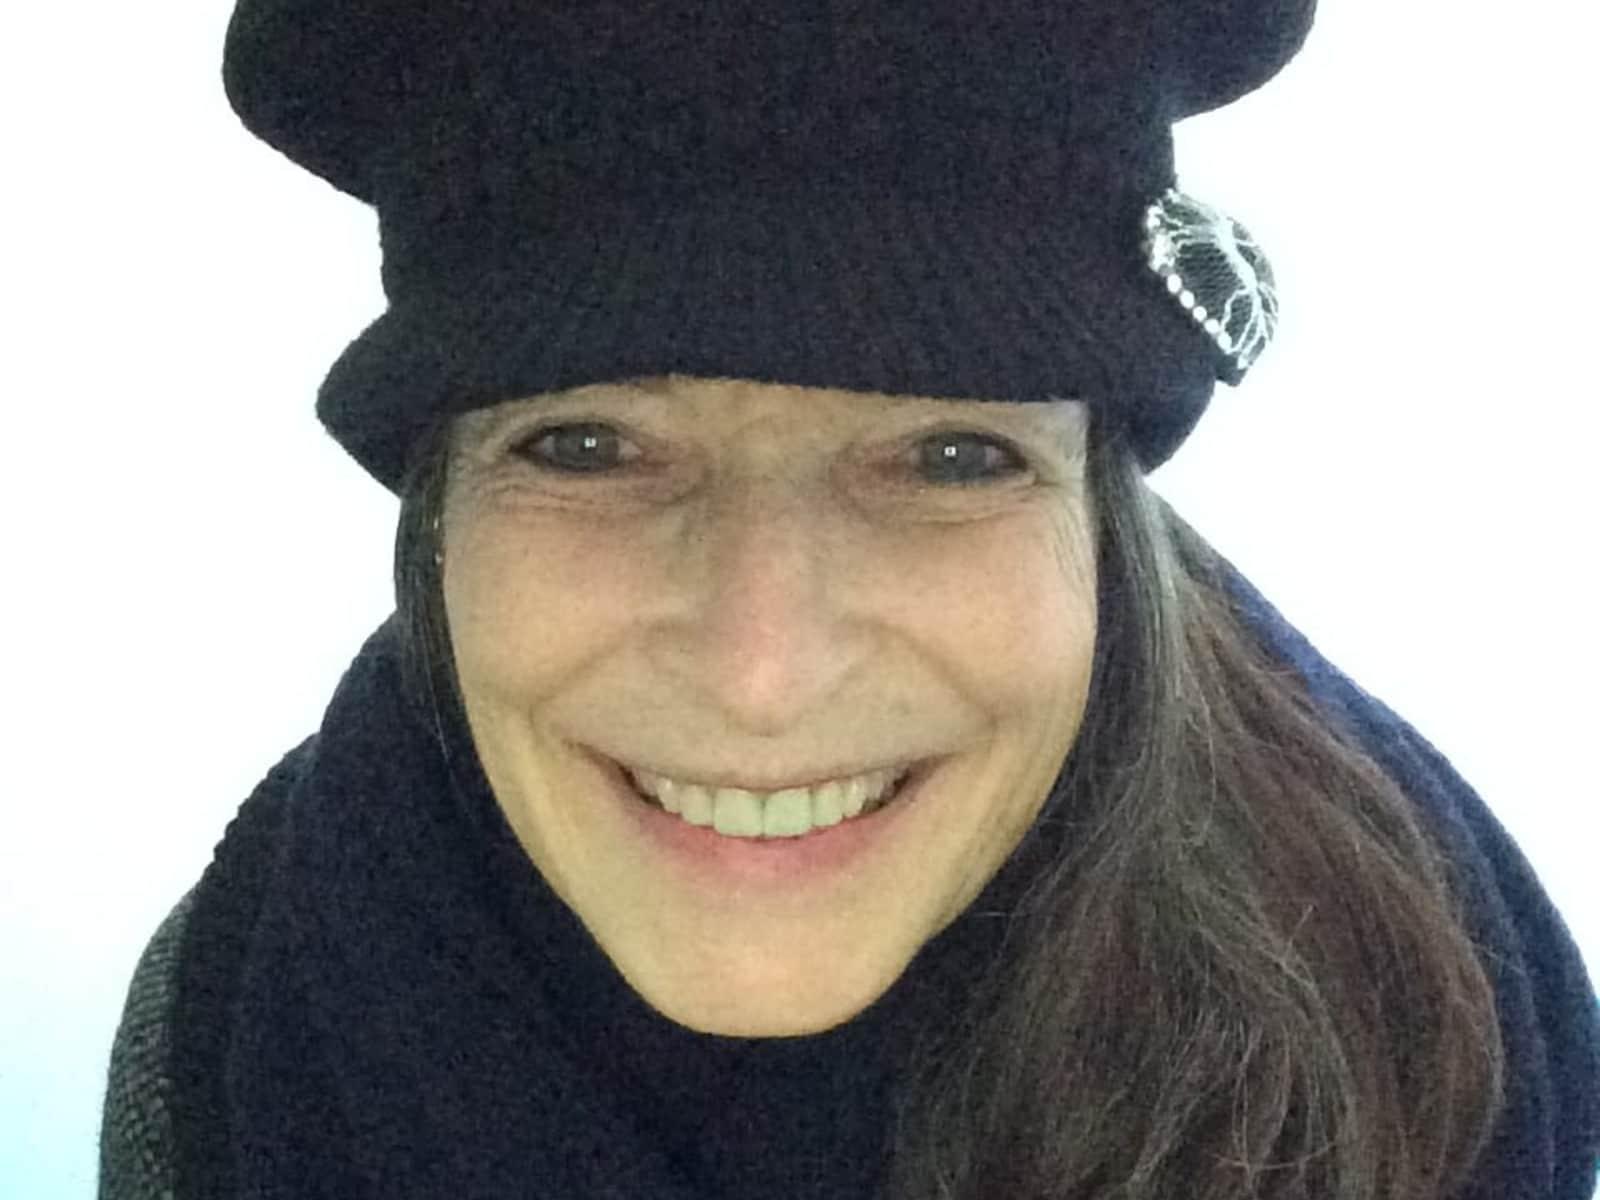 Susan from Beaverton, Oregon, United States